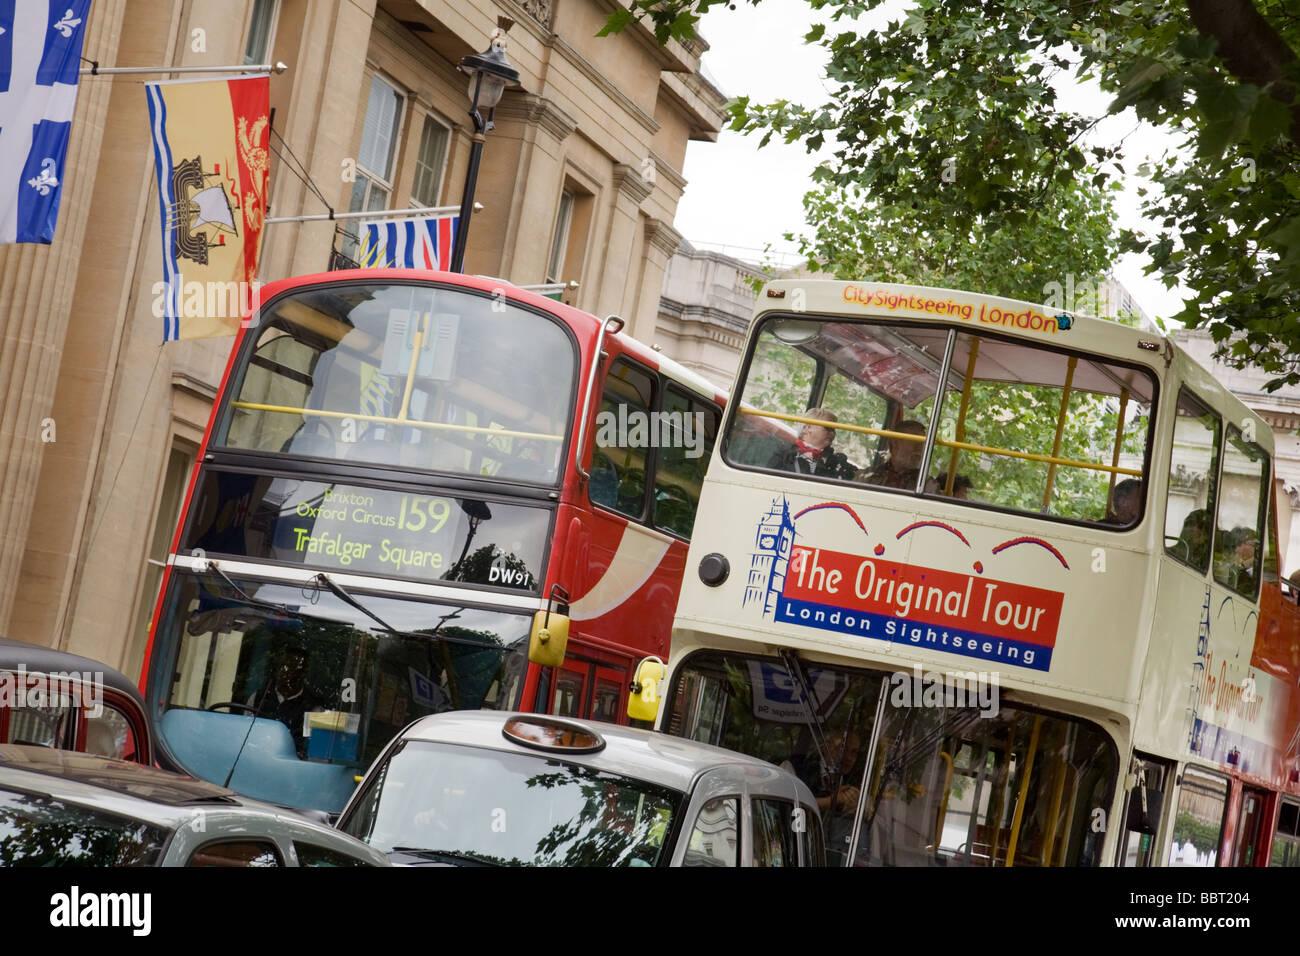 An 'Original Tour'  bus, and a London double decker bus,  London, UK - Stock Image